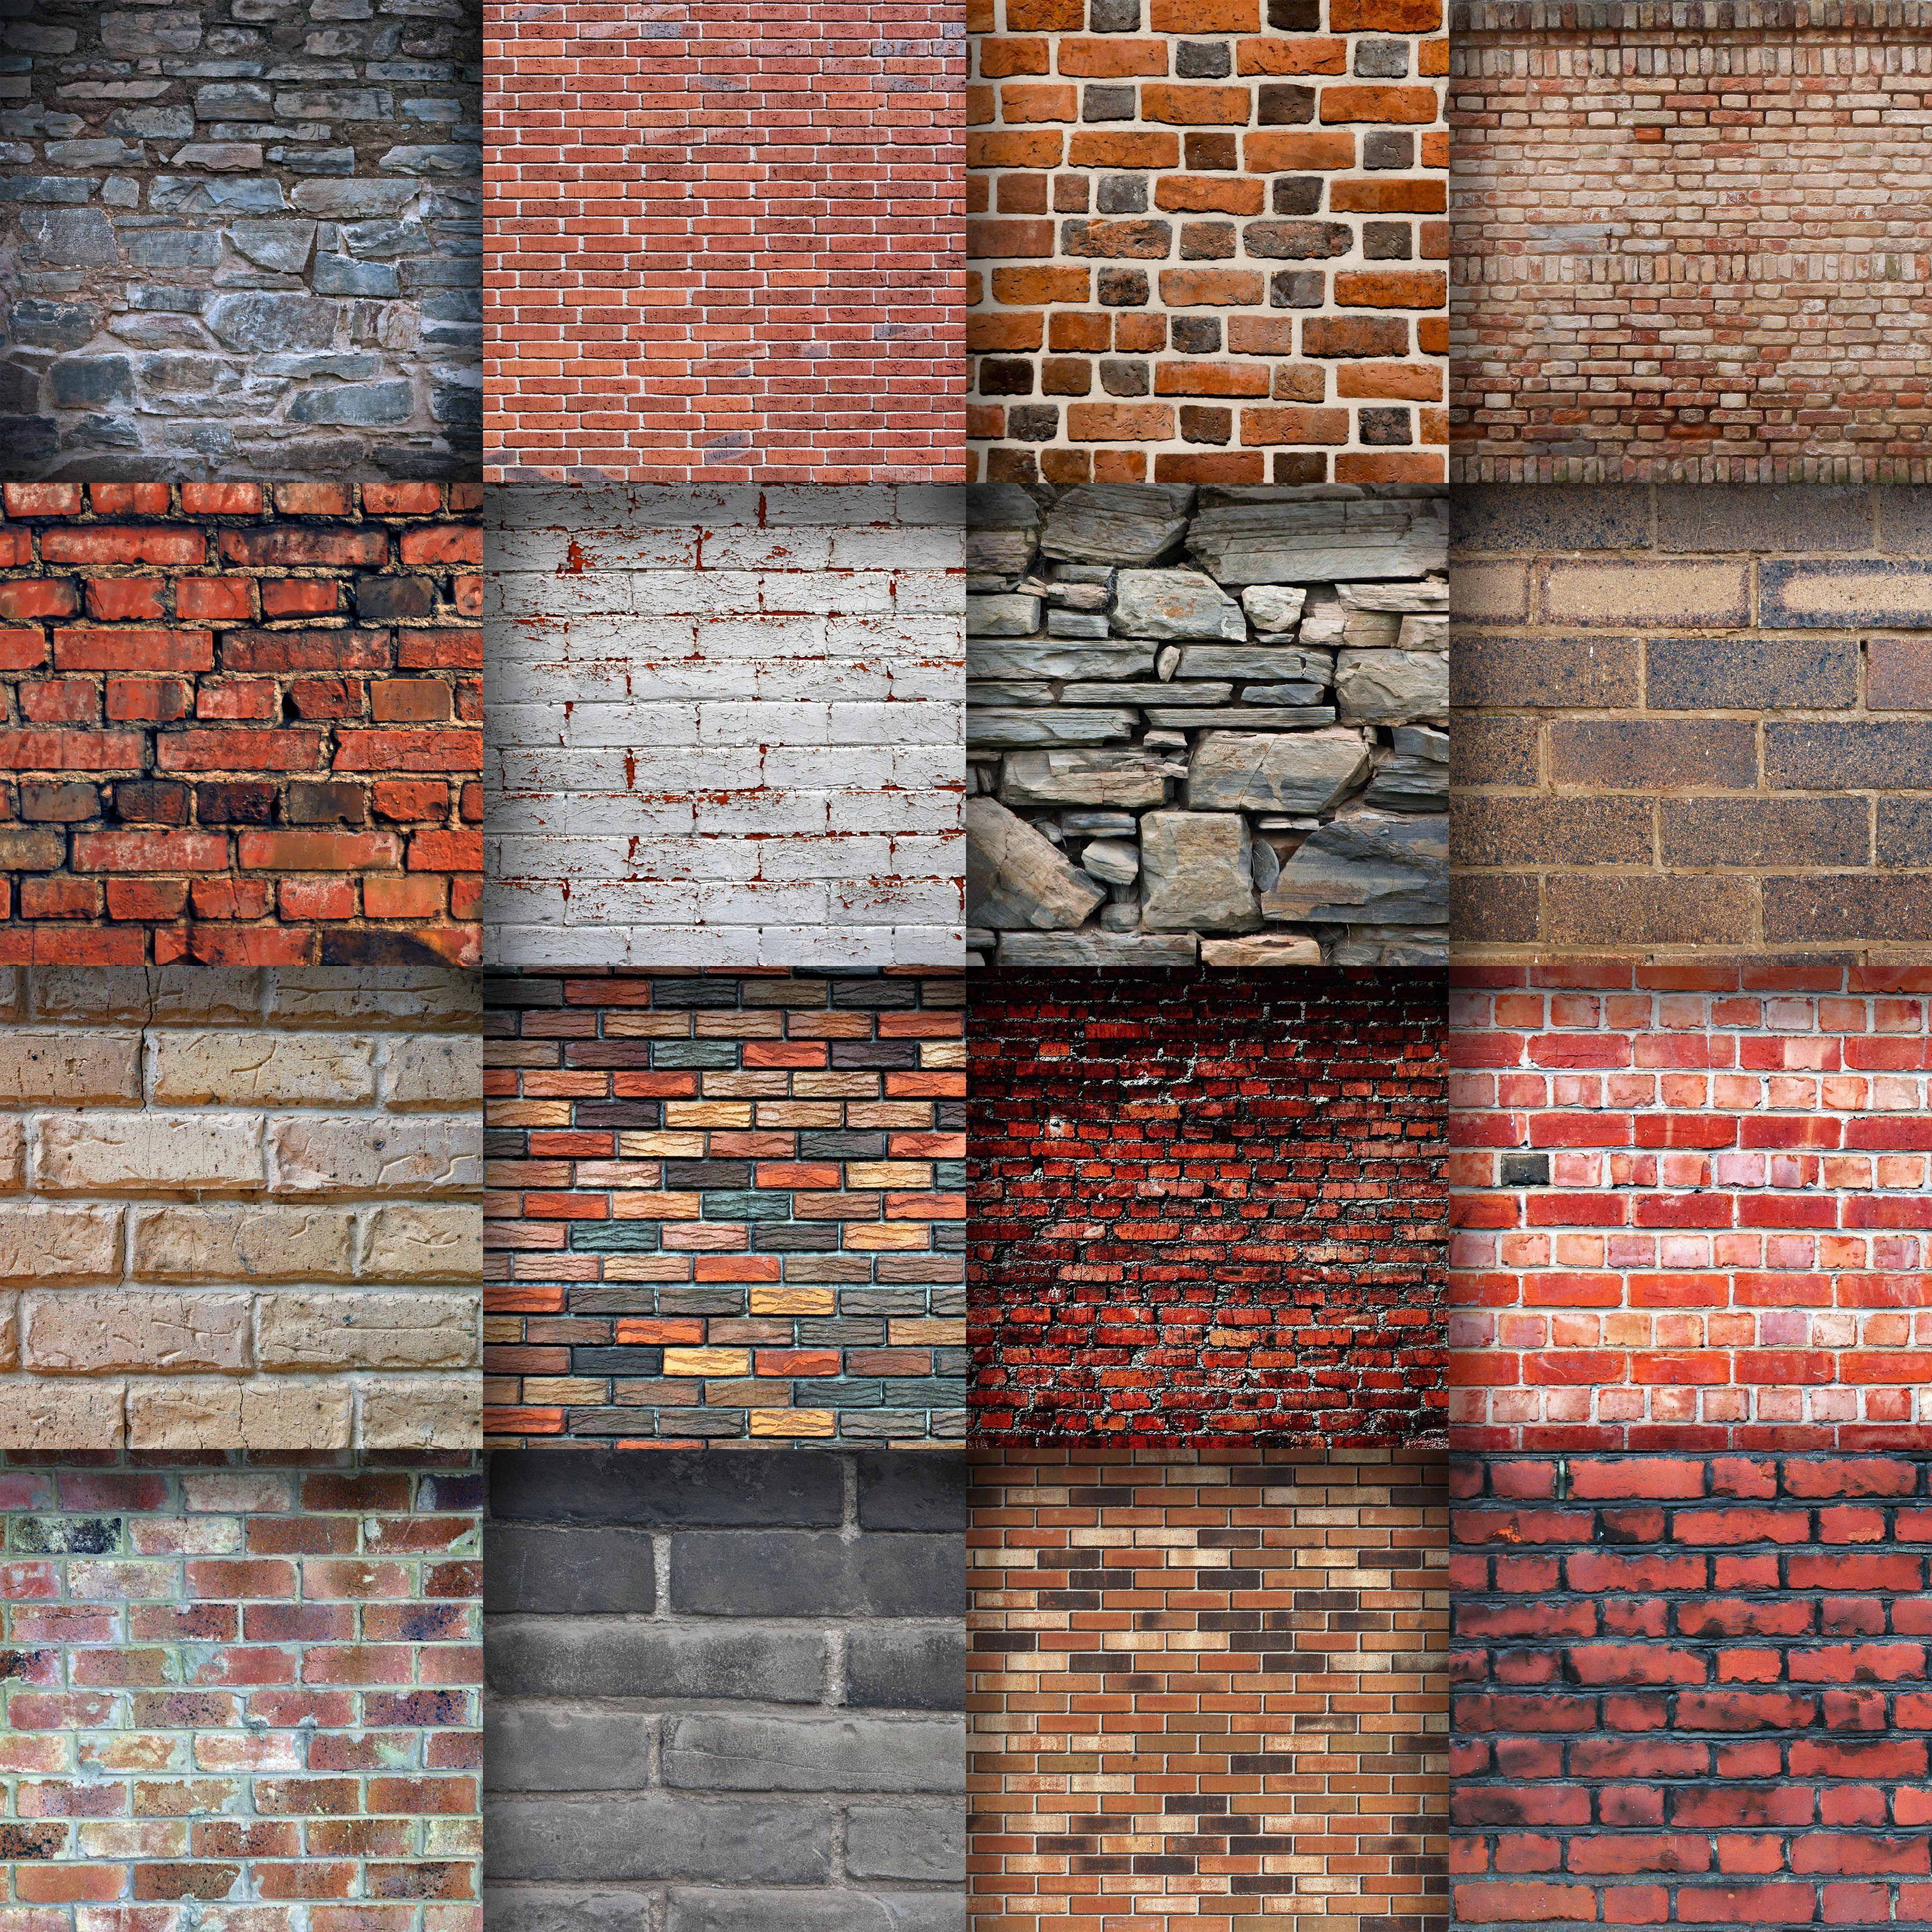 Brick Wall Textures Digital Paper 37219 Backgrounds Design